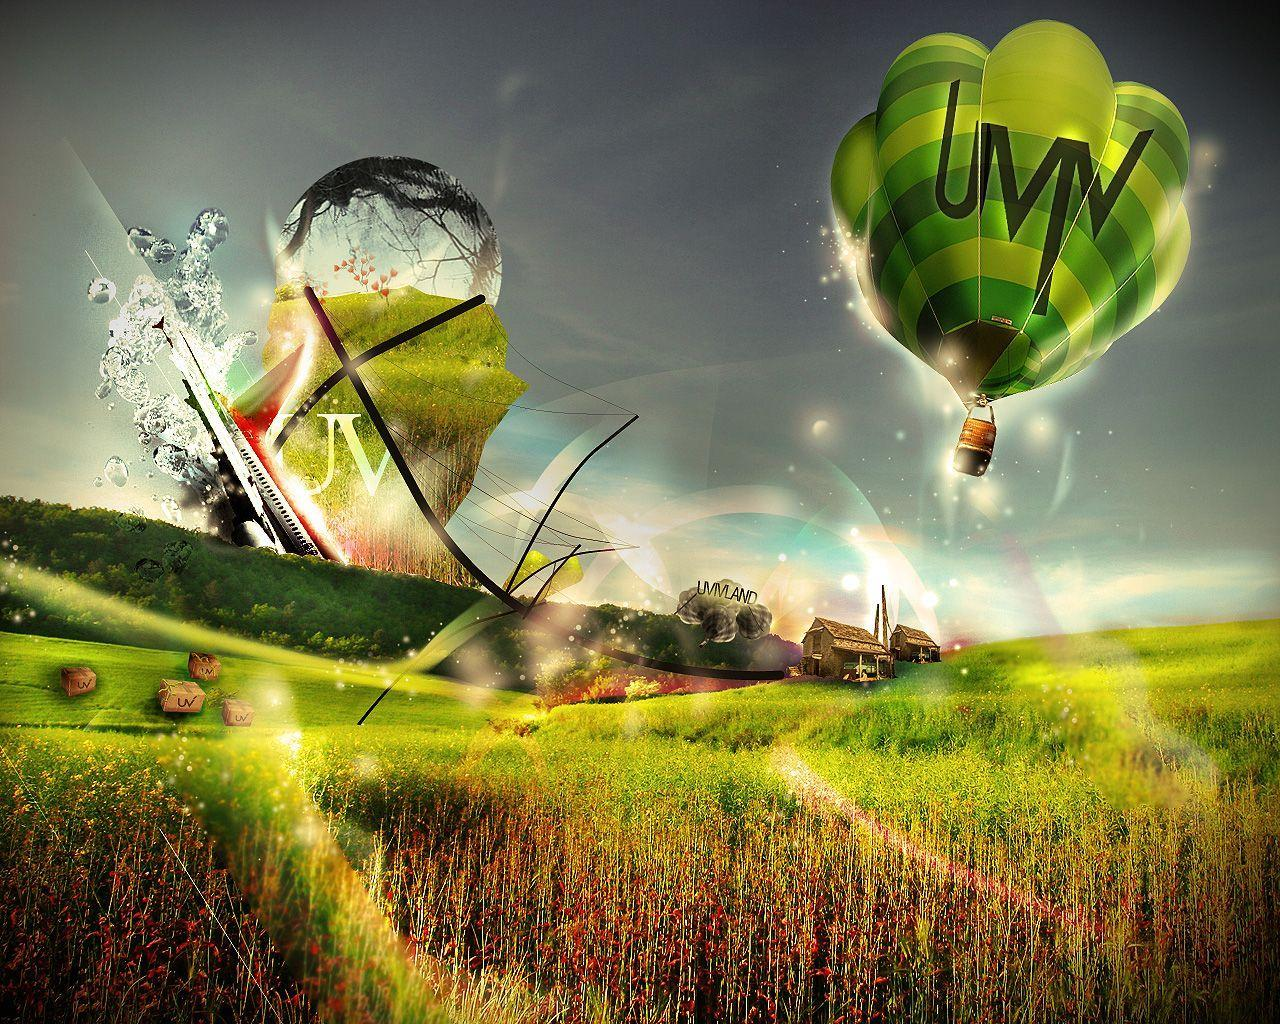 http://4.bp.blogspot.com/-jL2ZT1ZNOdg/TfUV_VO9EUI/AAAAAAAAAN4/znIPGH0PMXk/s1600/3D+Nature+Wallpapers-9.jpg